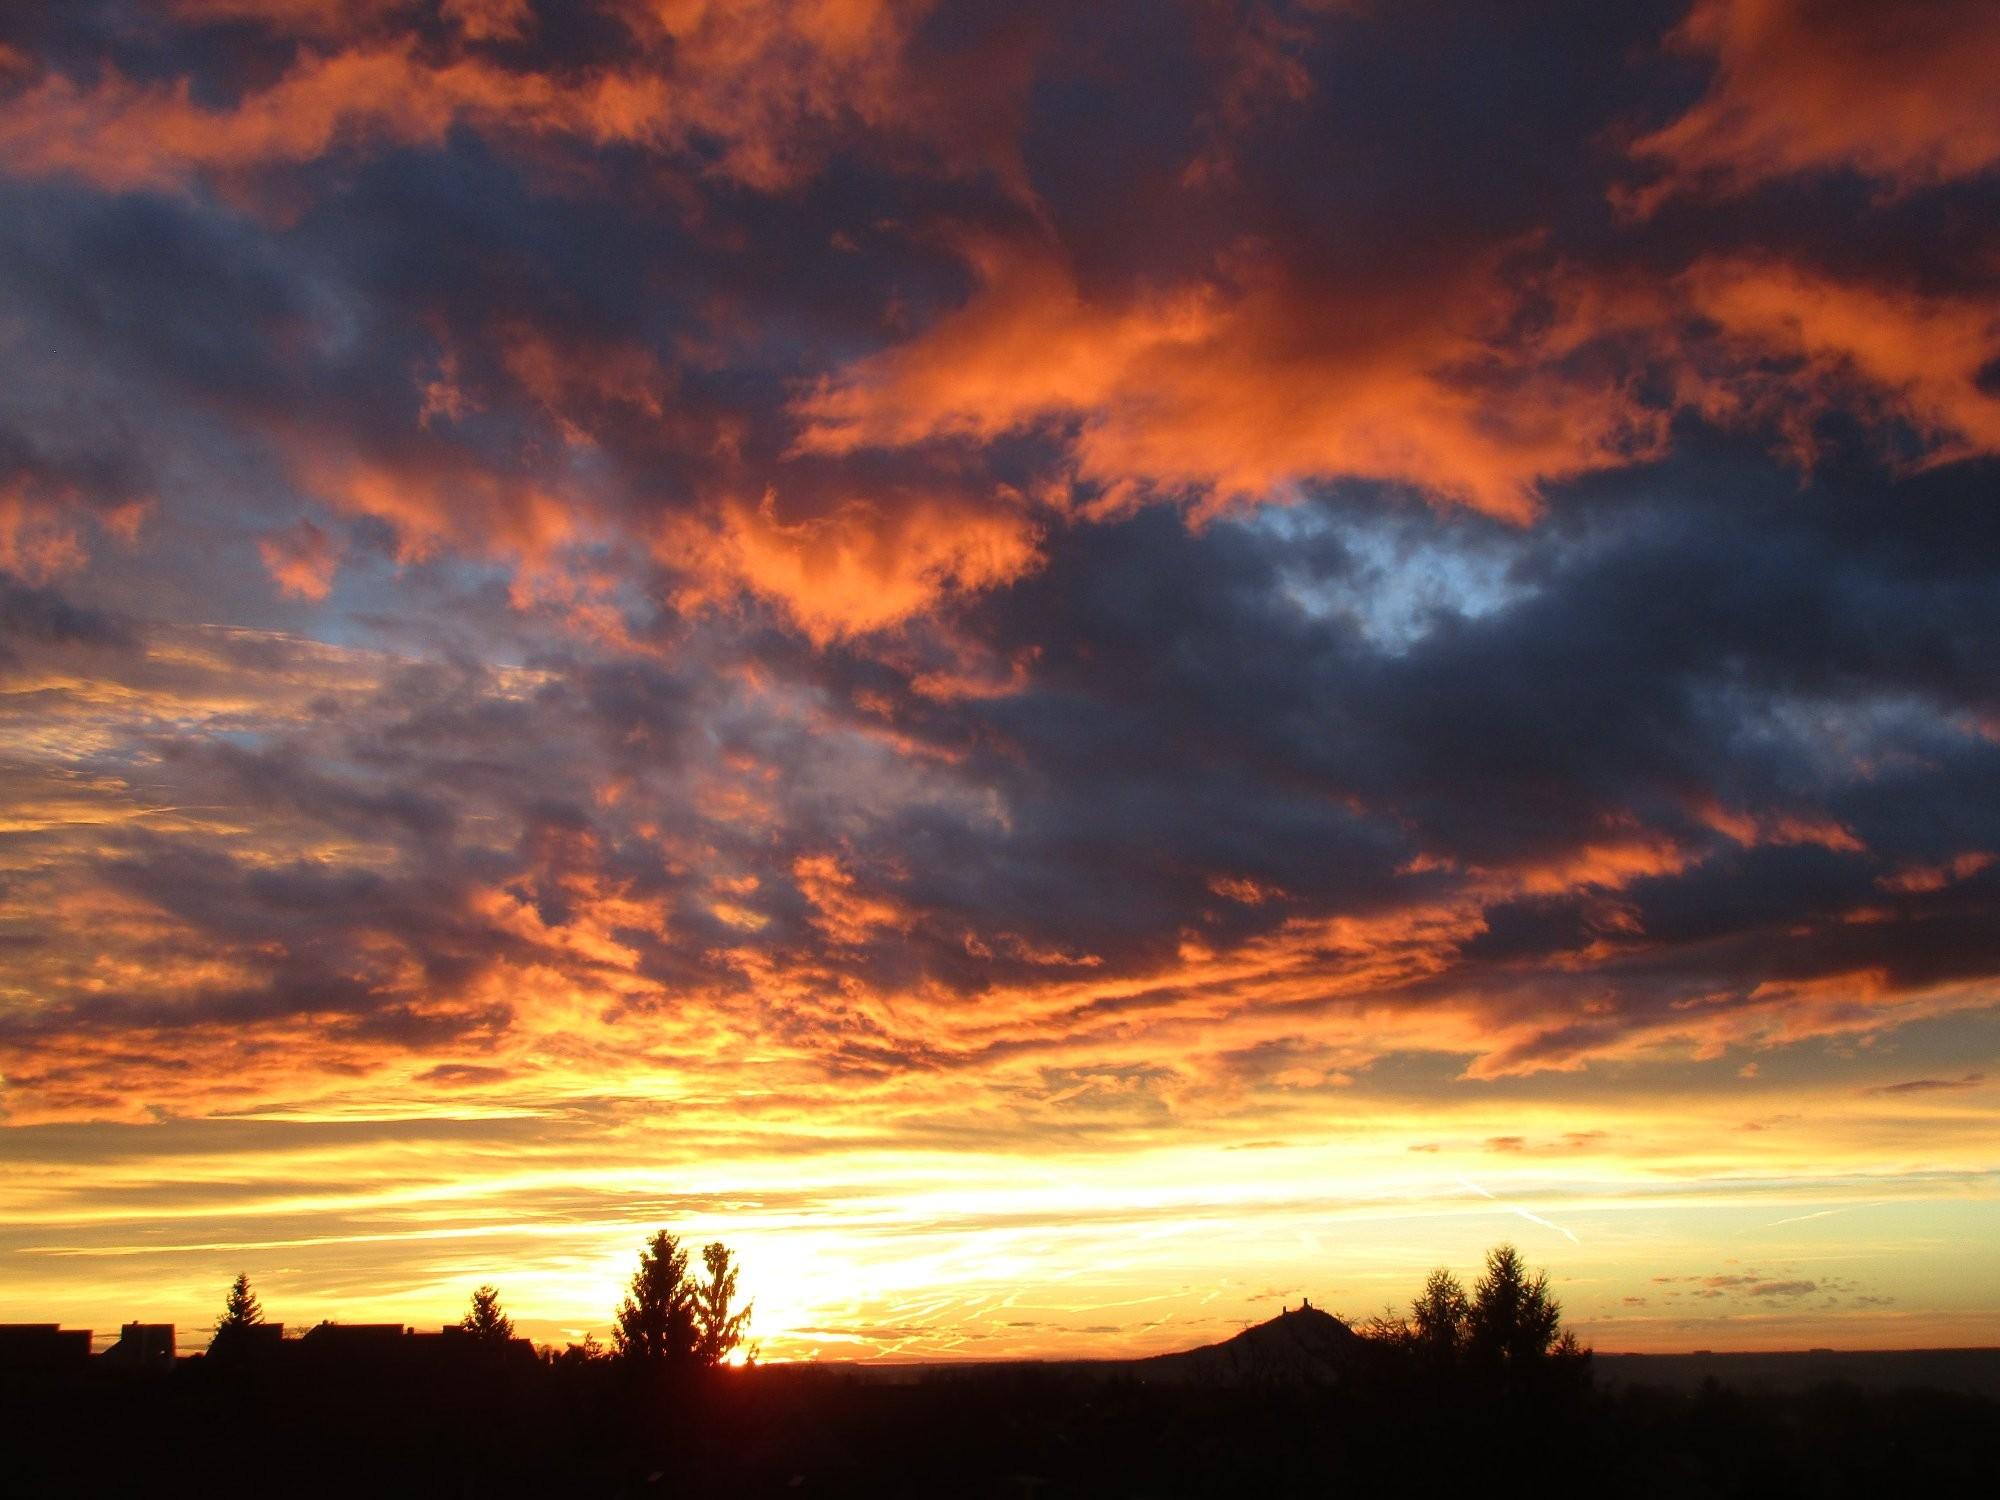 Východ slunce nad hradem Hazmburkem